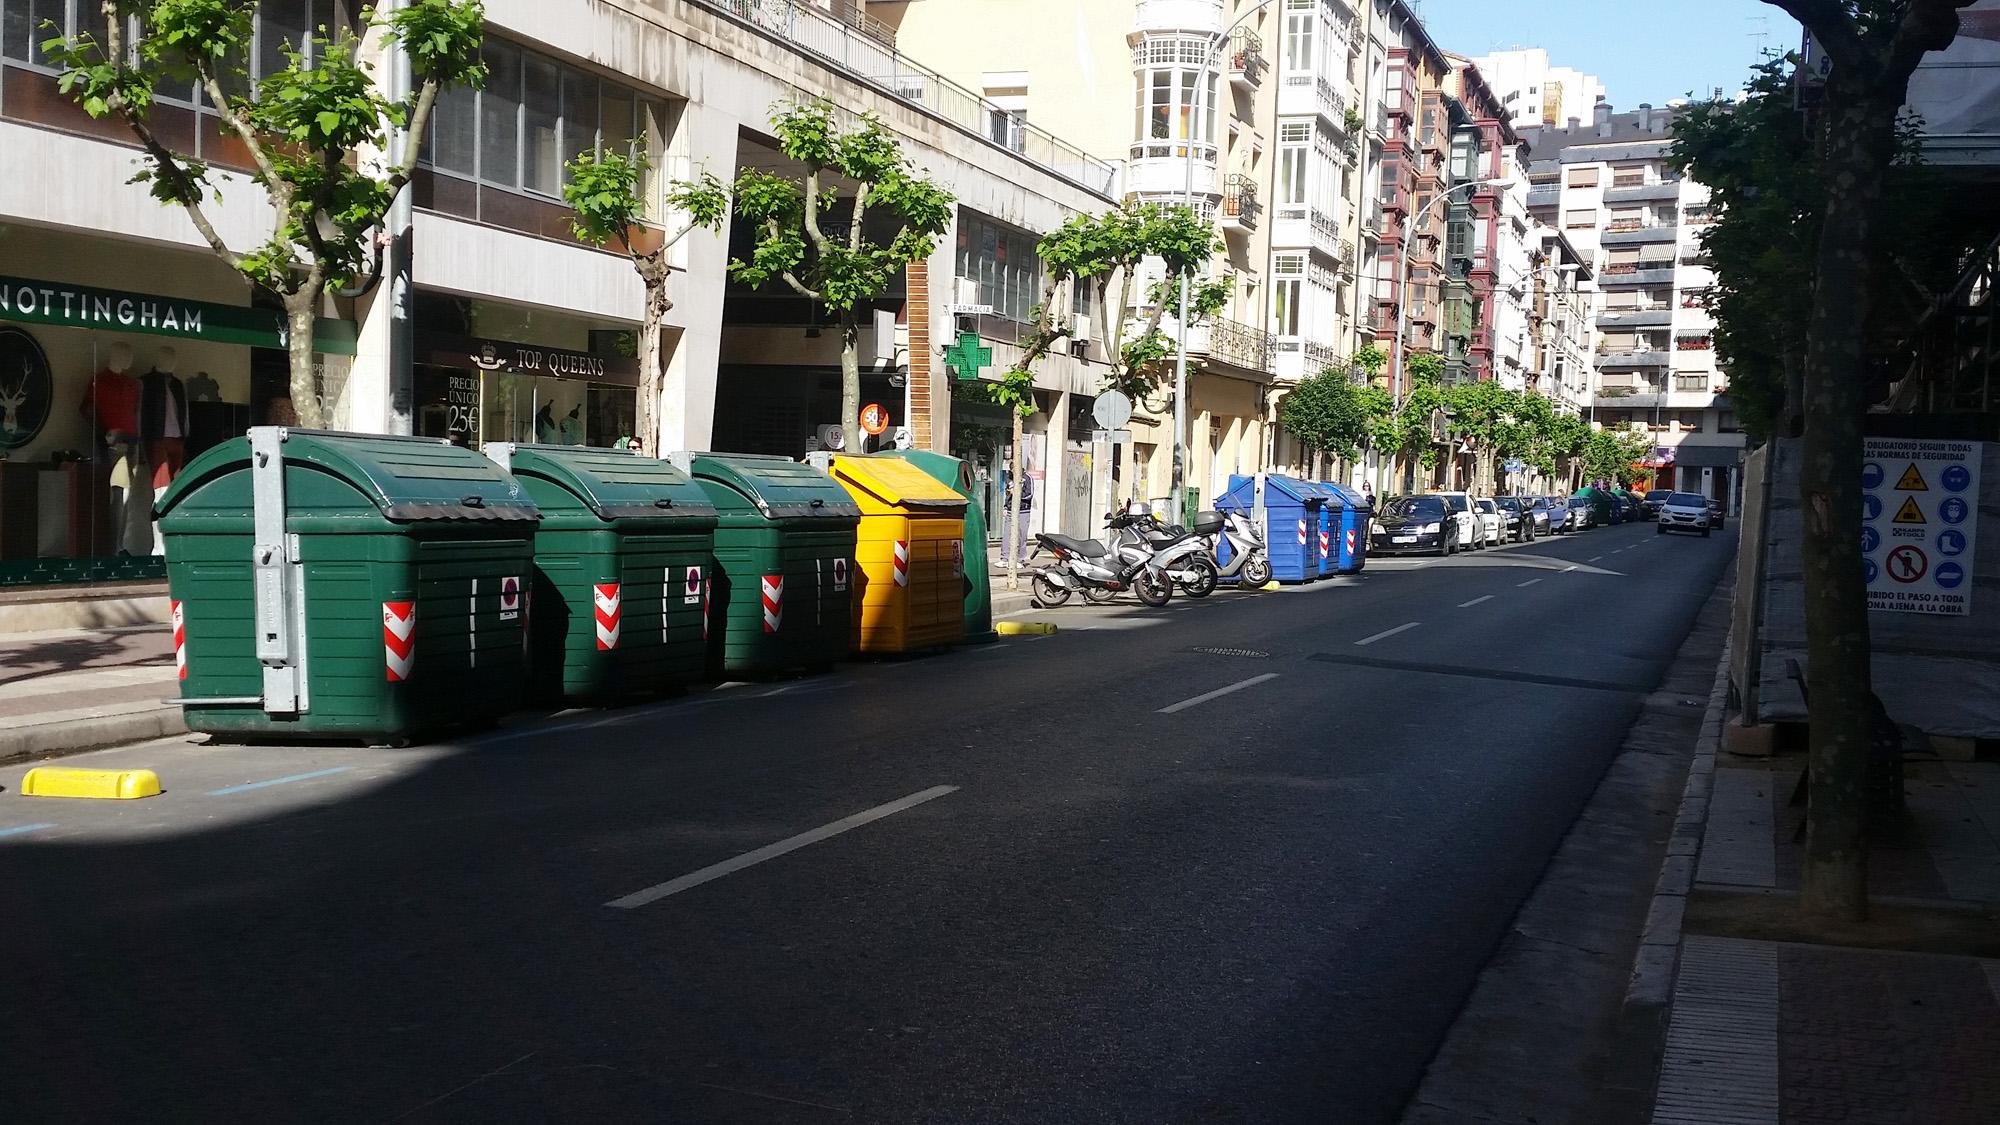 Avenida de portugal la calle m s limpia de logro o - Espacios verdes logrono ...